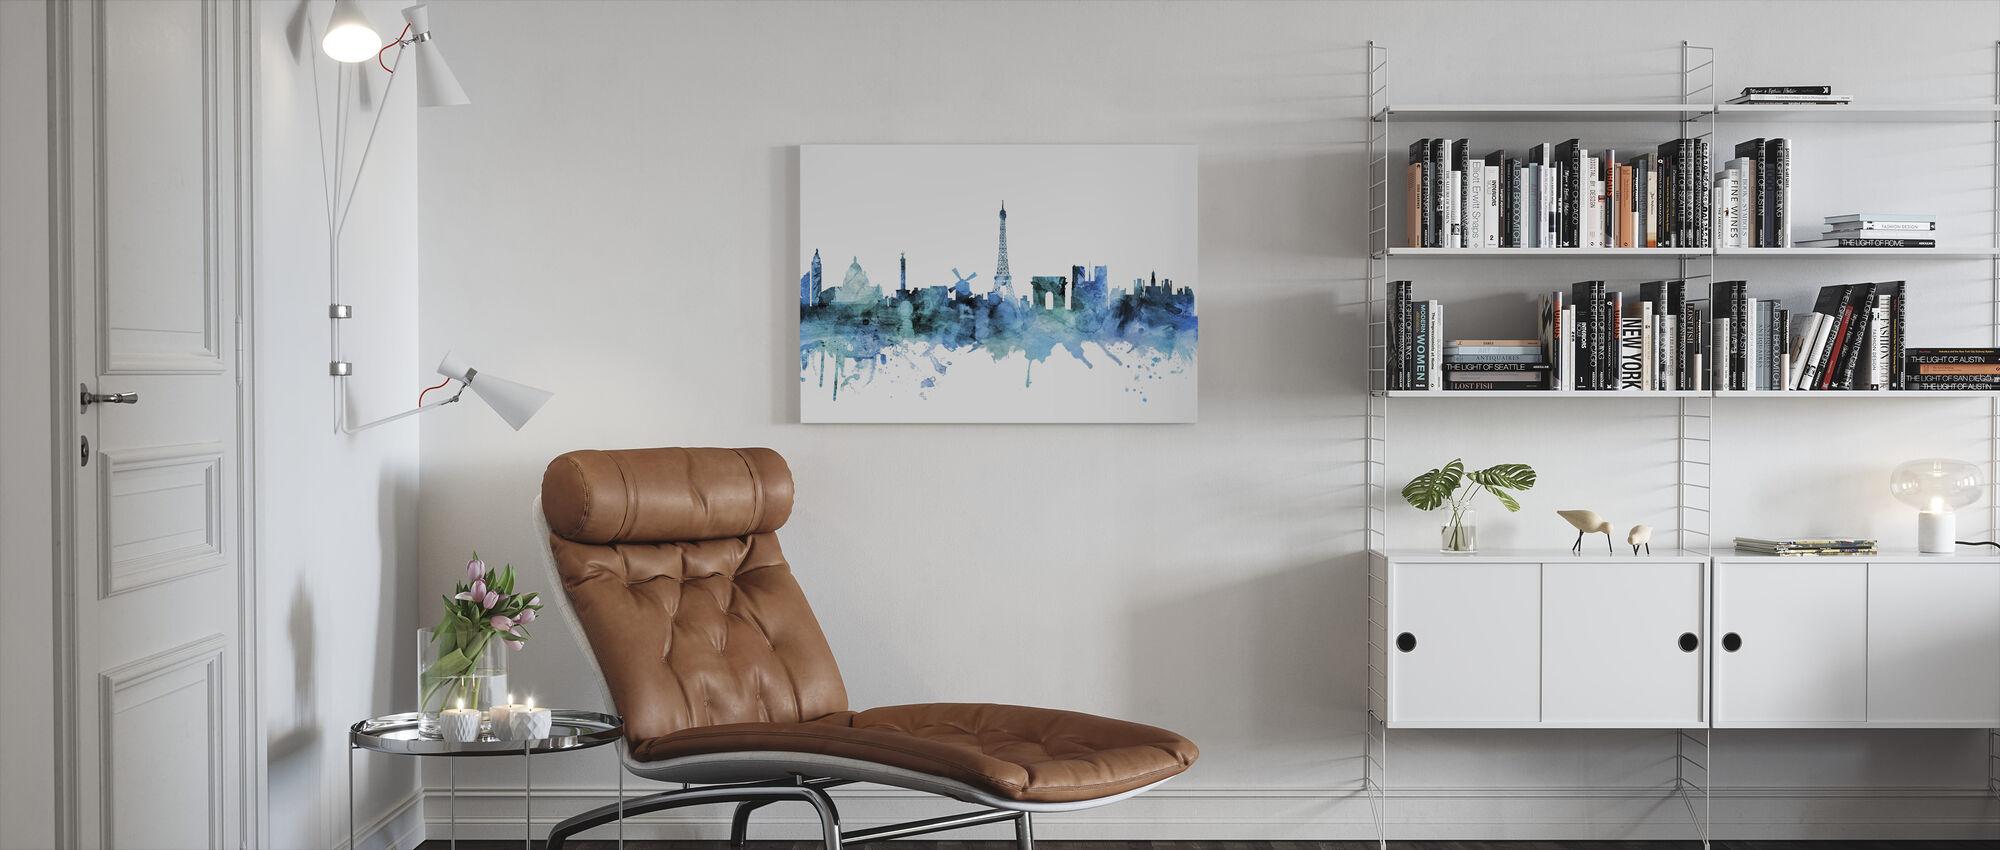 Paris France Skyline - Canvas print - Living Room